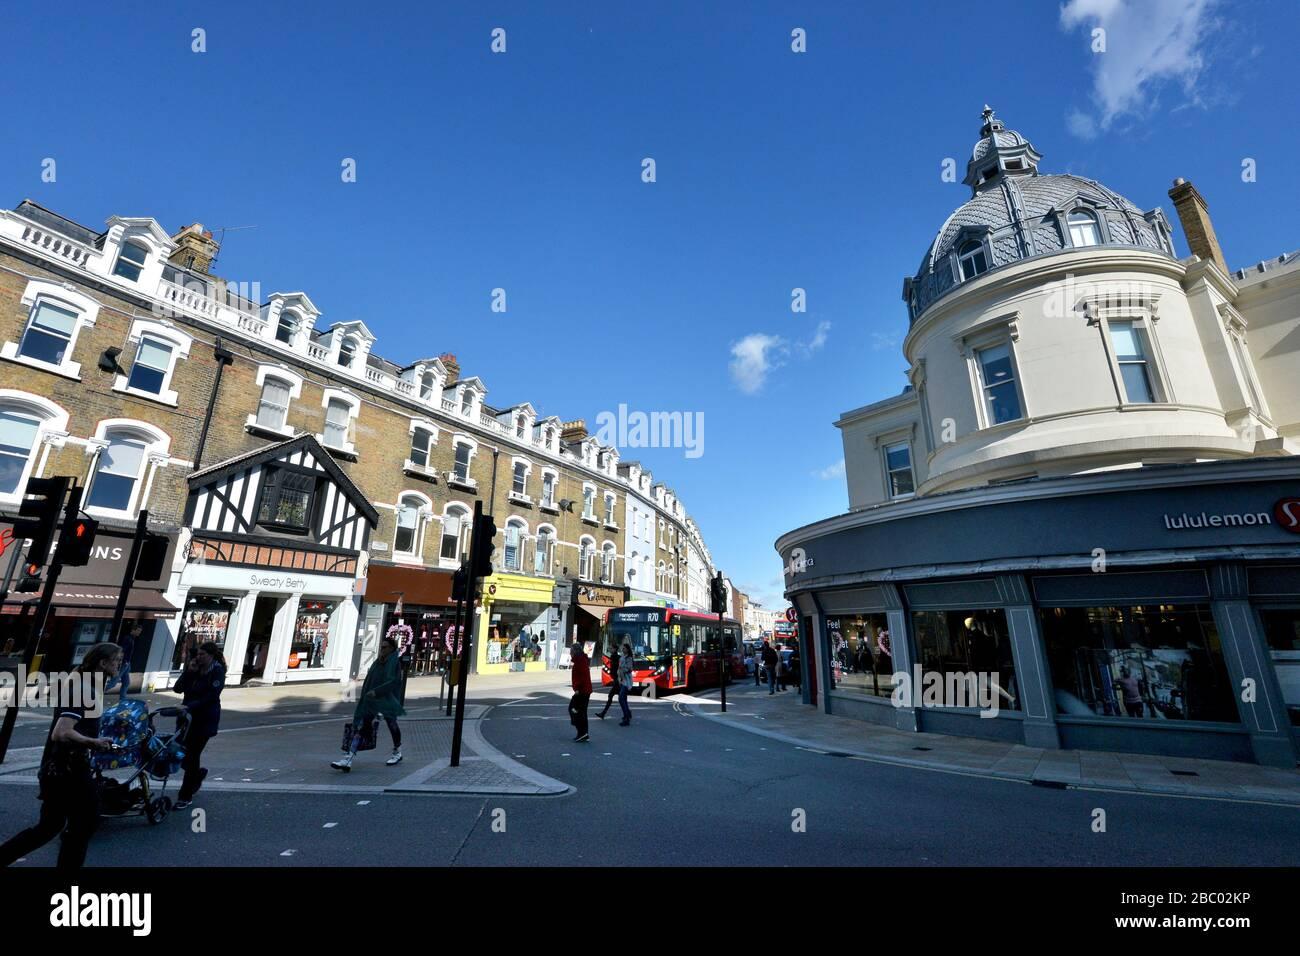 The Quadrant, Richmond, London, UK Stock Photo